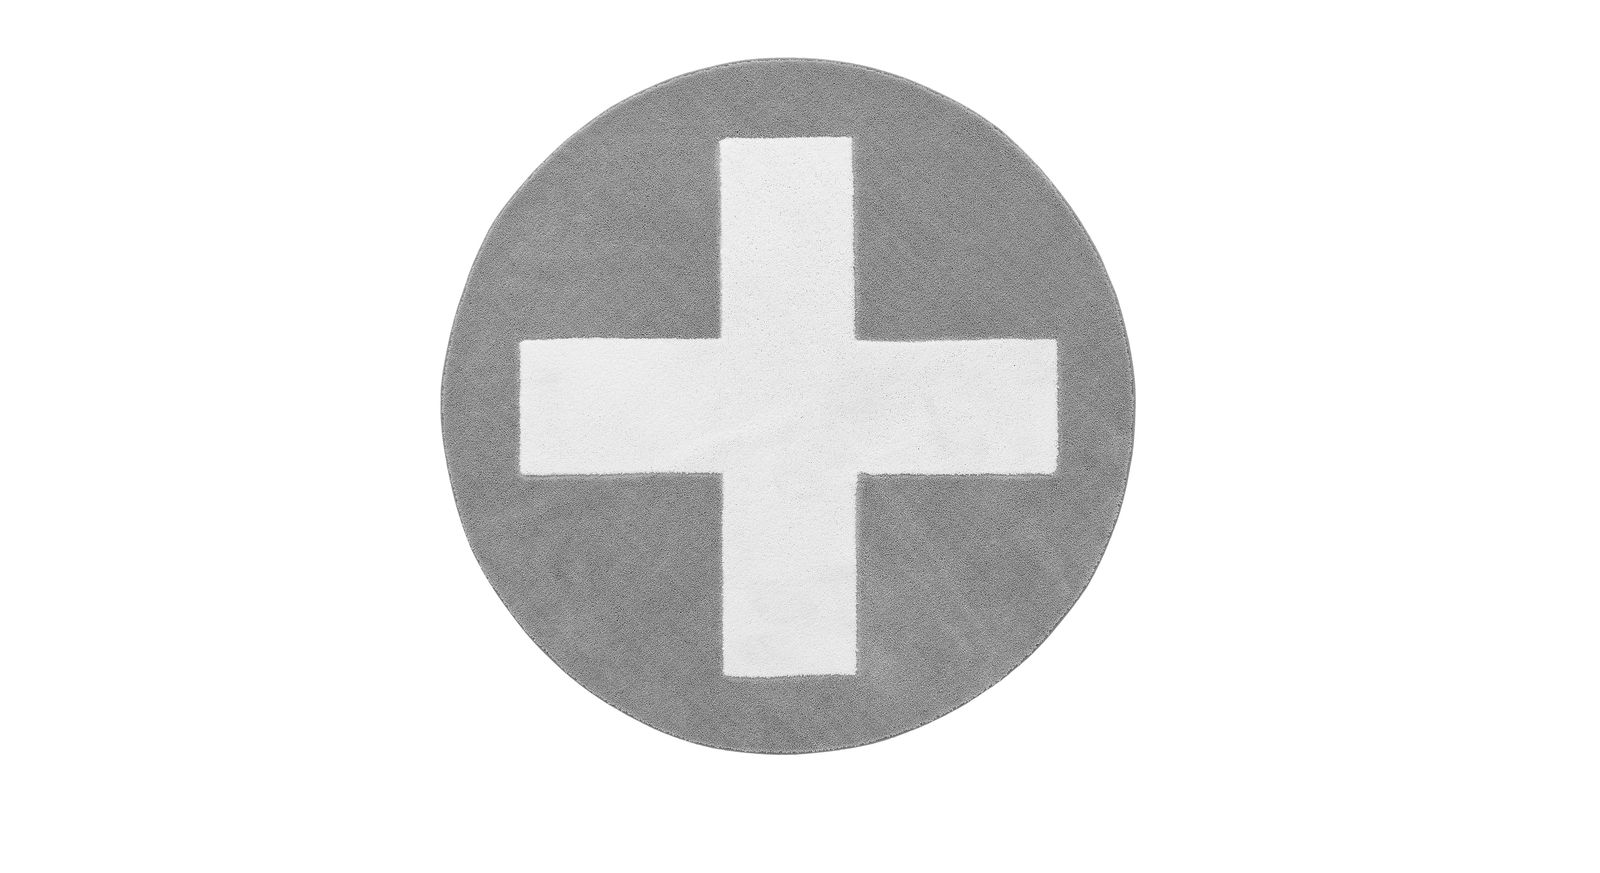 Teppich Kreuz in der Farbe Grau